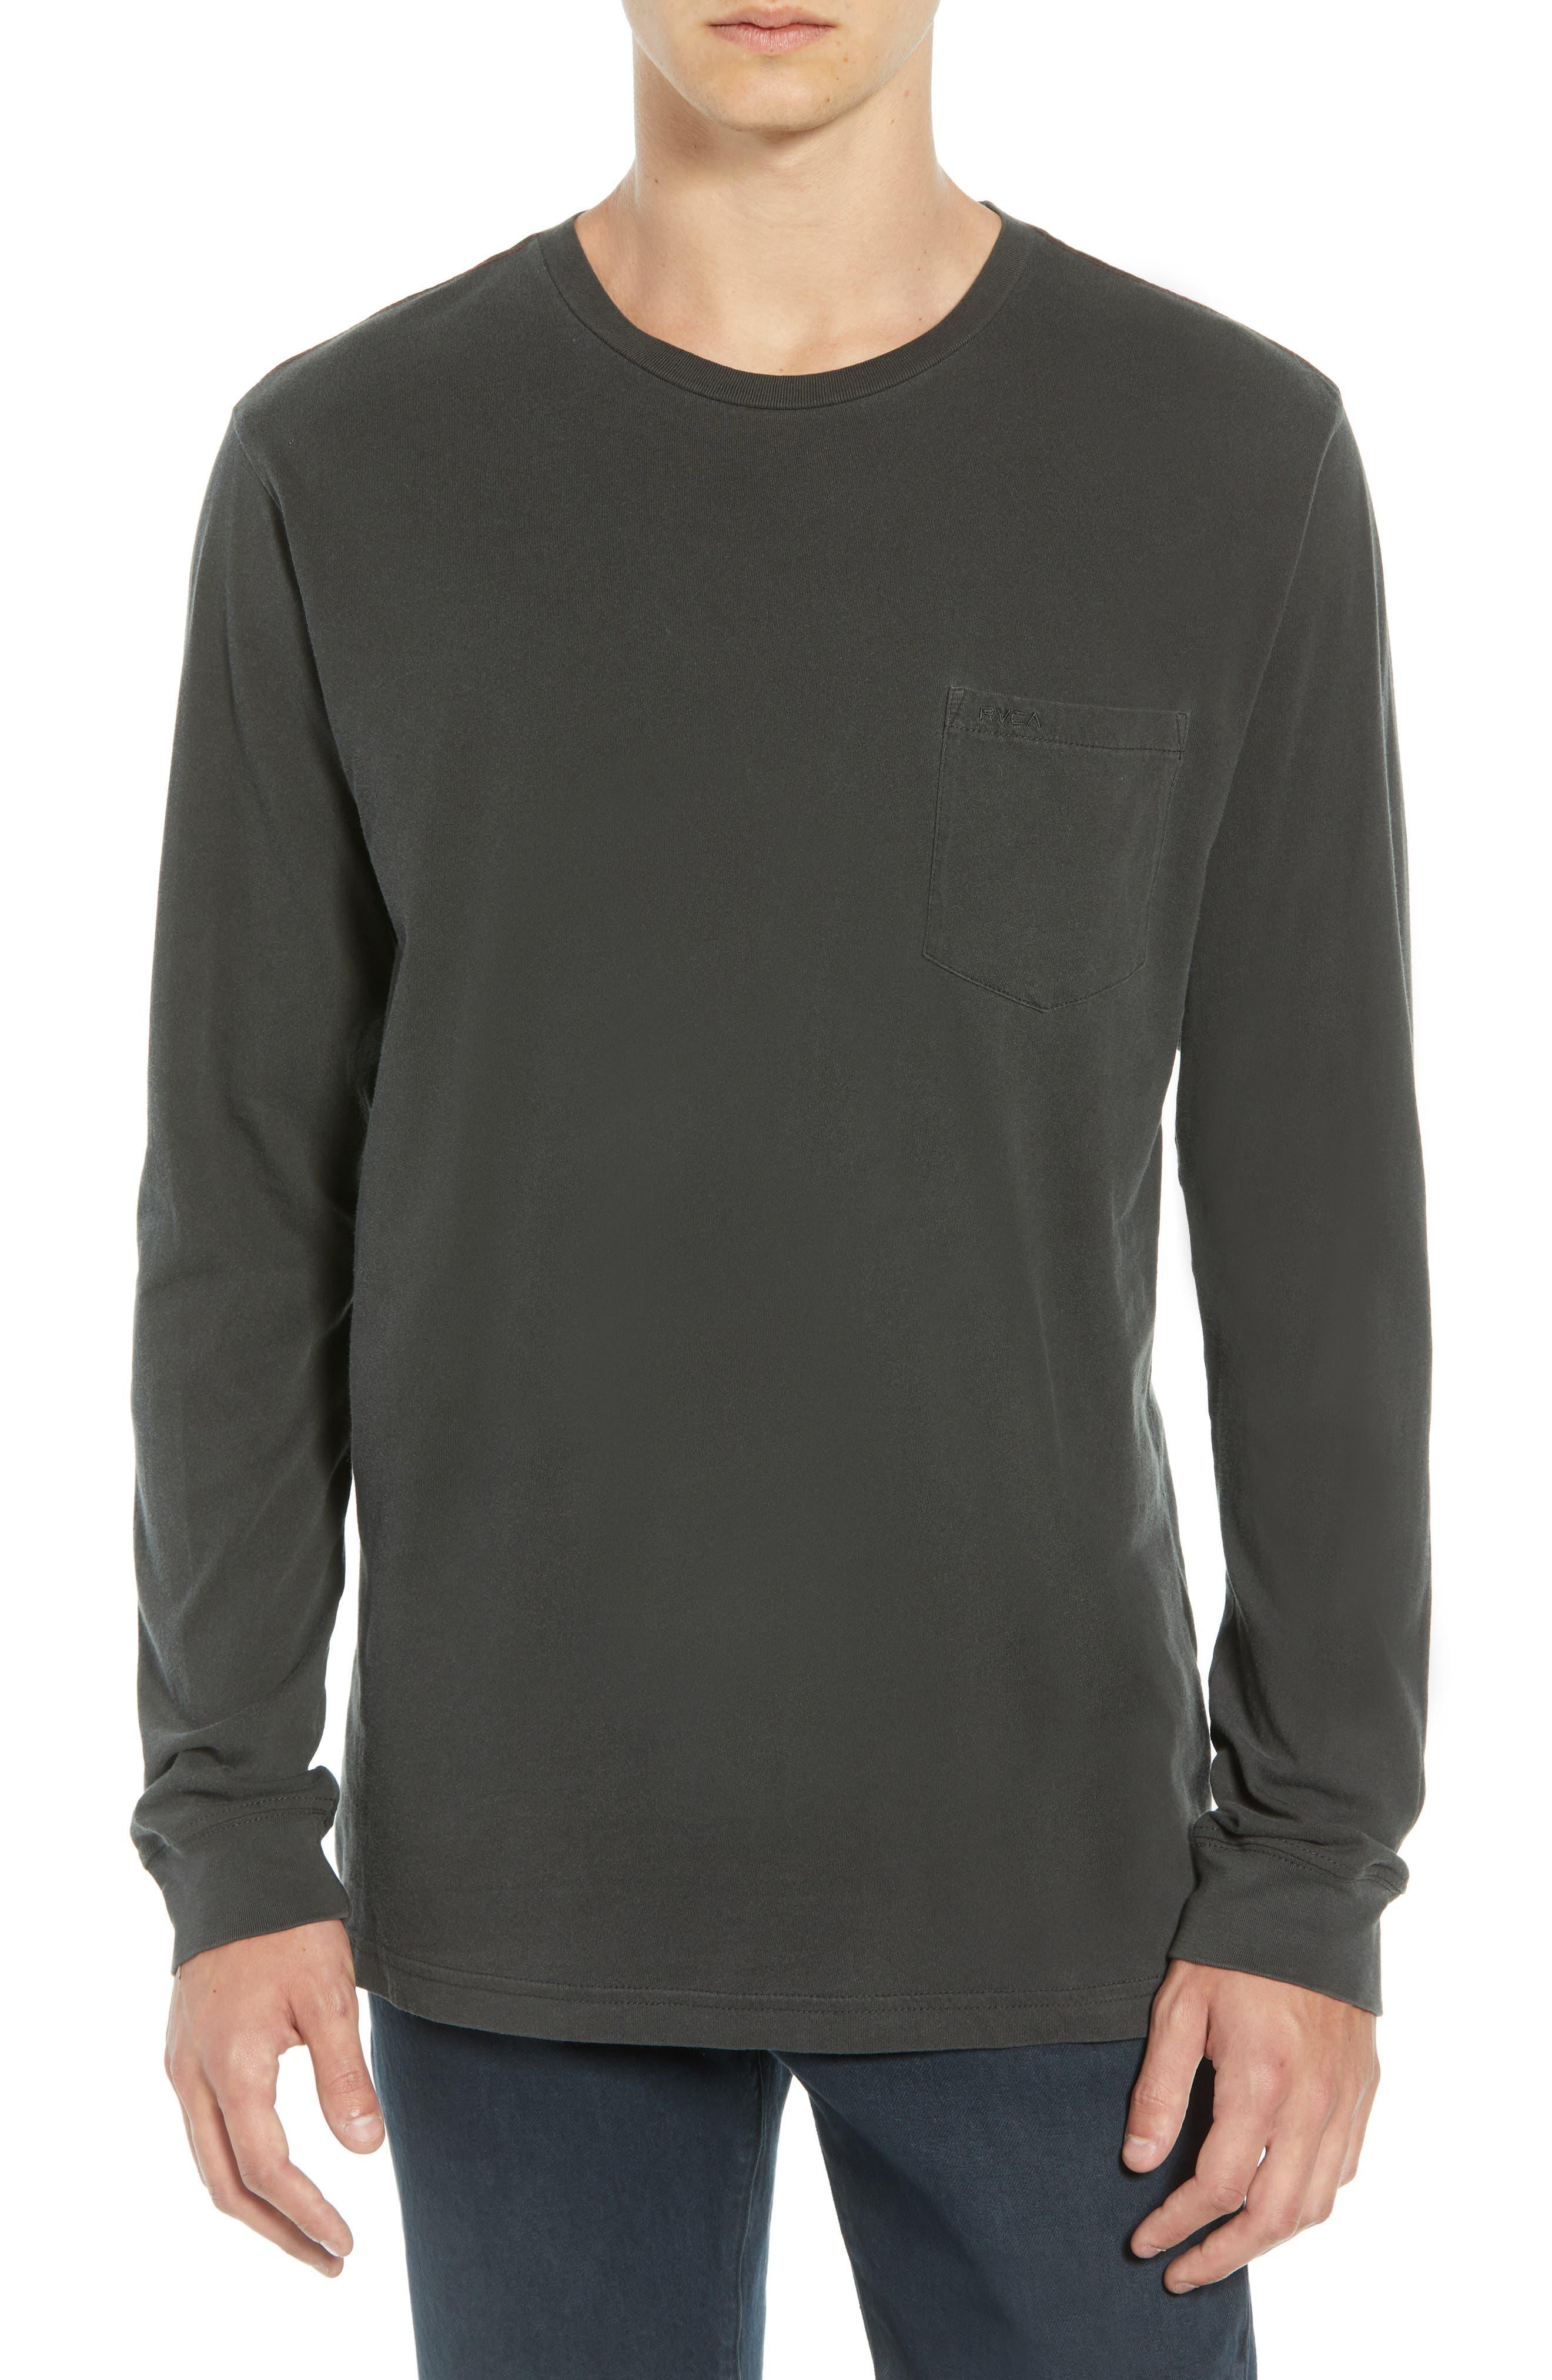 PTC Pigment Long Sleeve T-Shirt,                             Main thumbnail 1, color,                             PIRATE BLACK